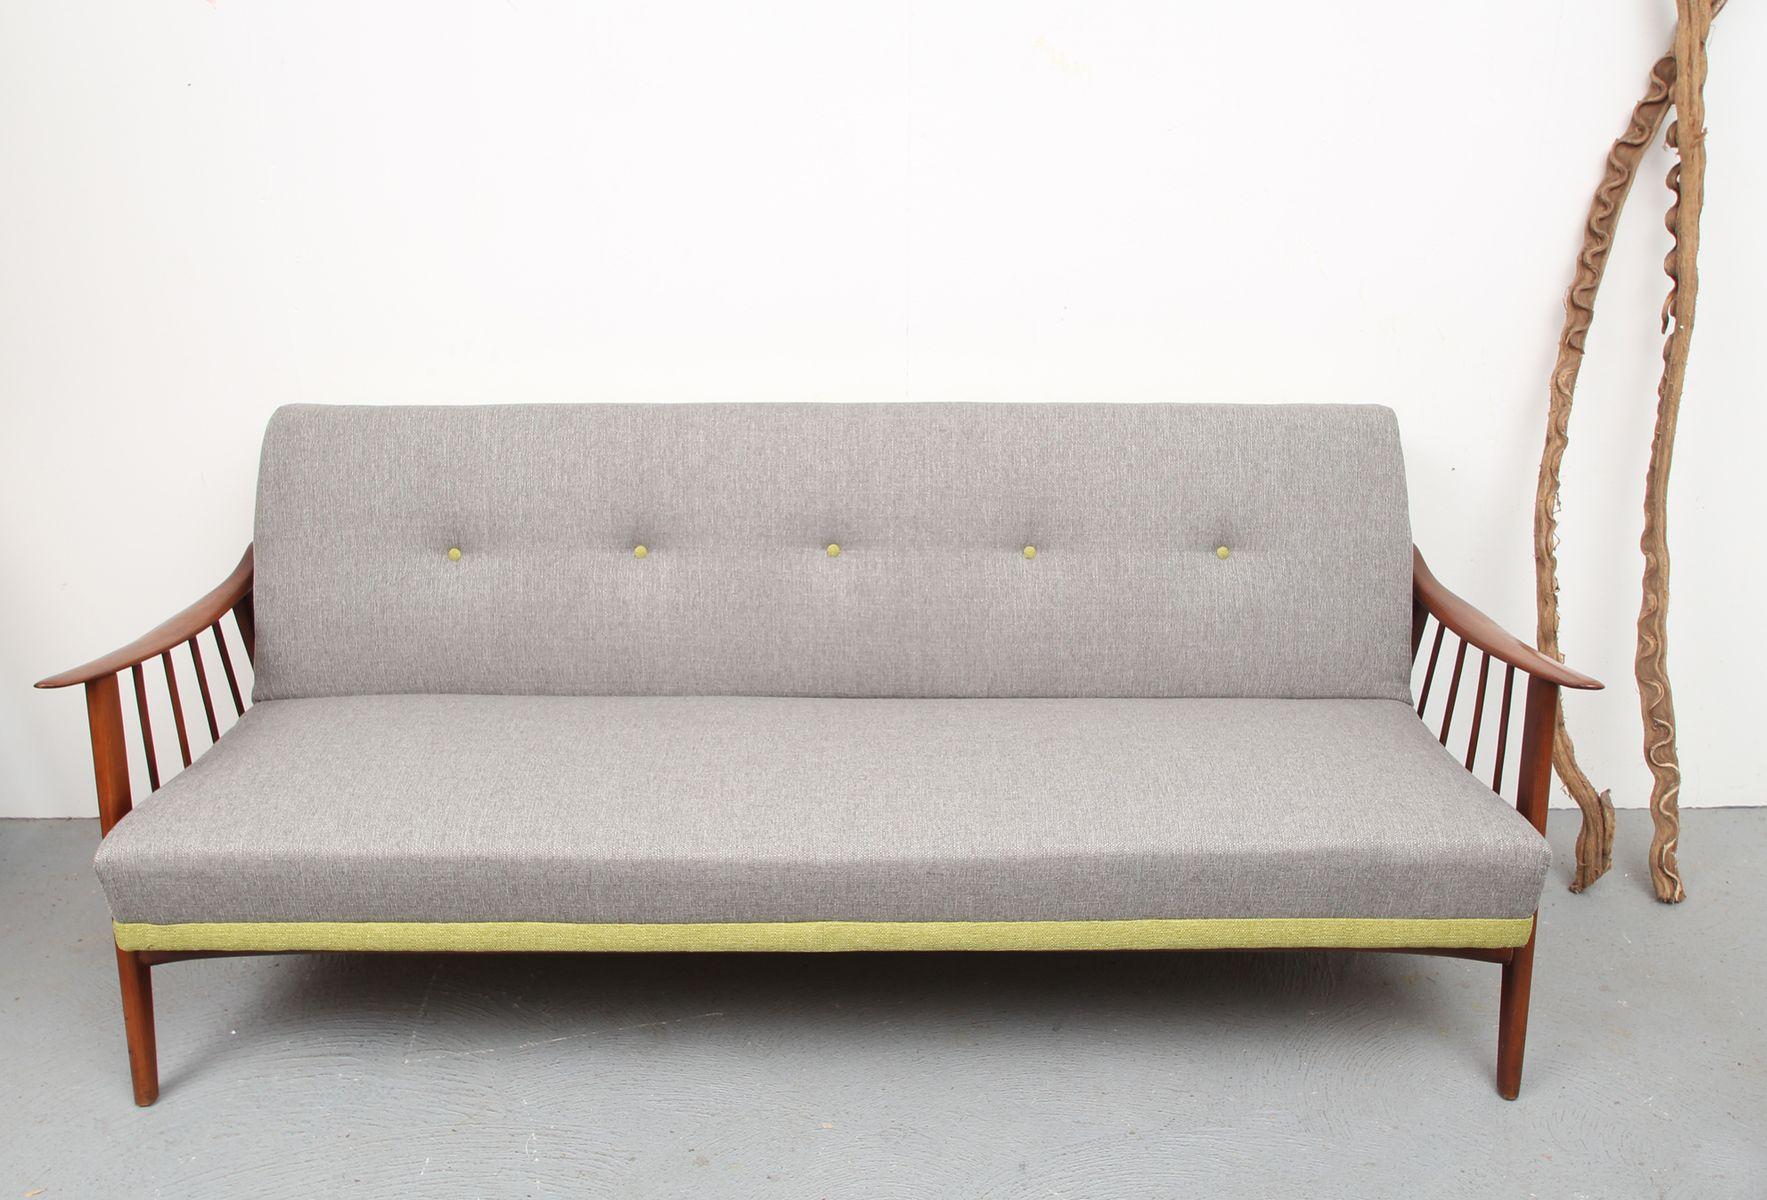 Vintage scandinavian daybed sofa 1950s for Divan 1950